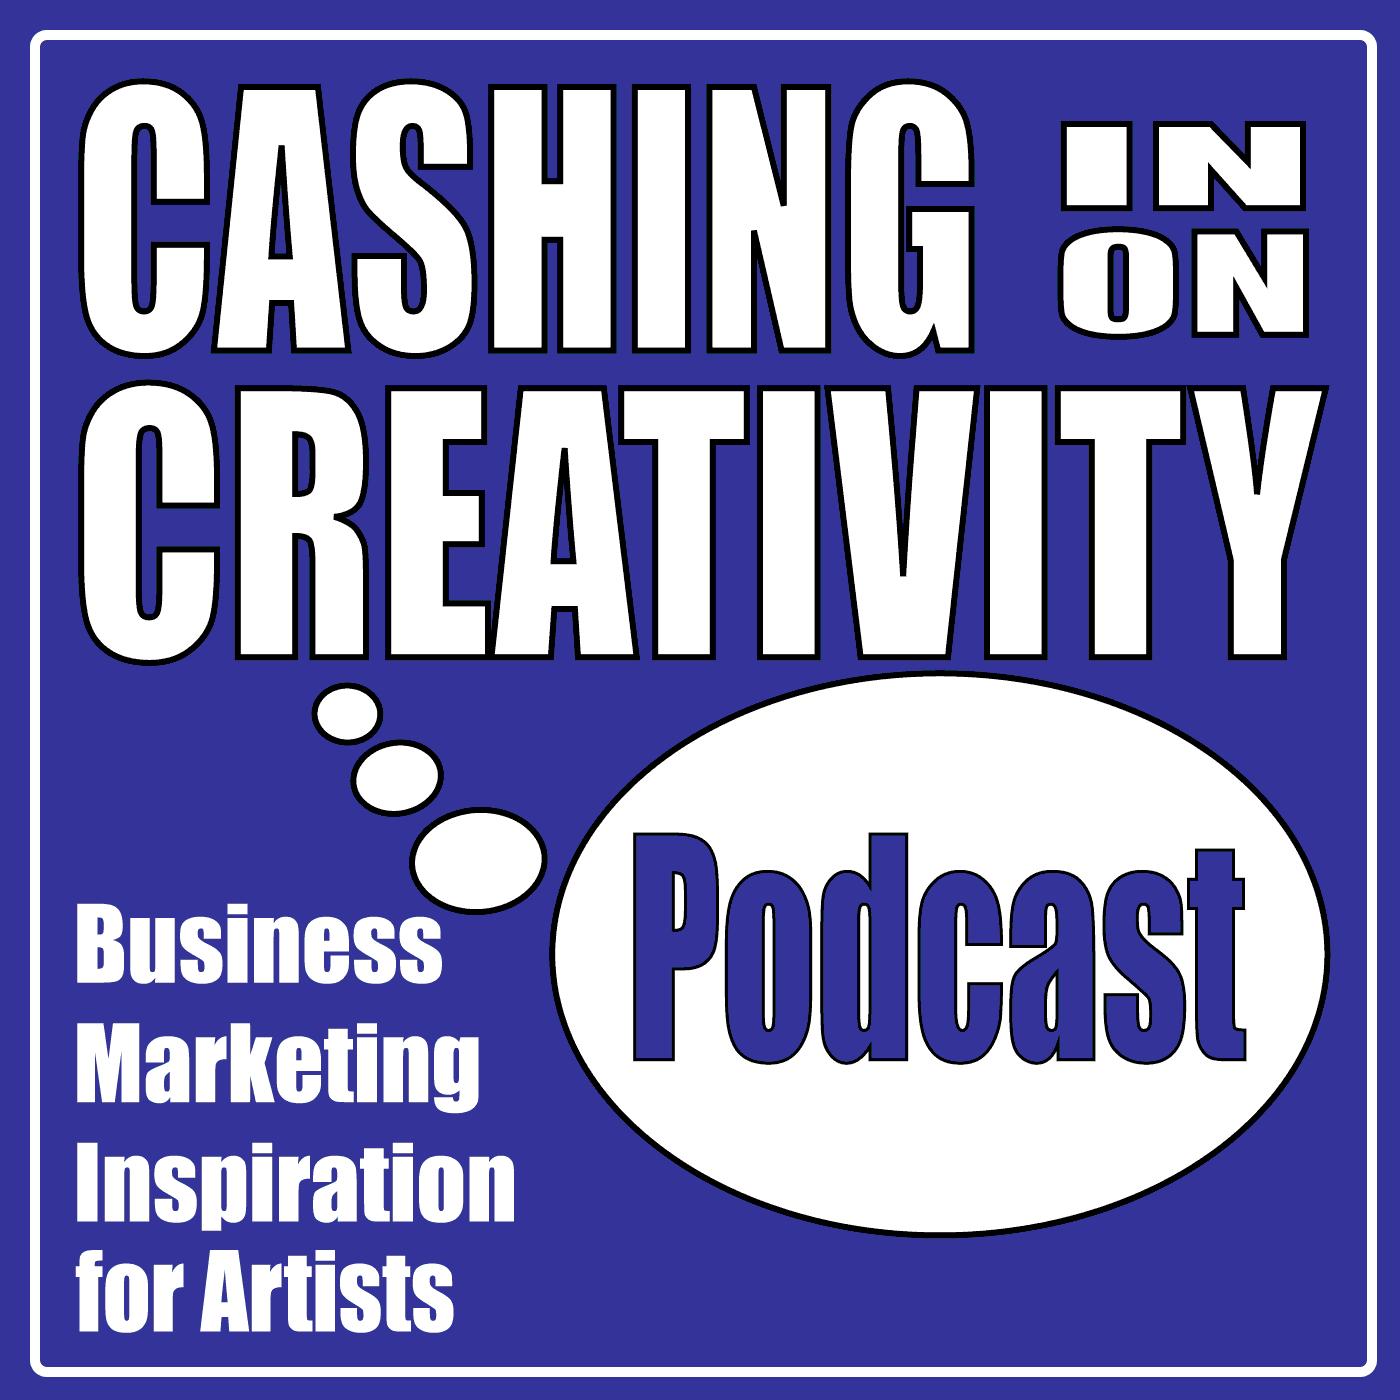 Cashing in on Creativity Podcast for Creative Entrepreneurs show art